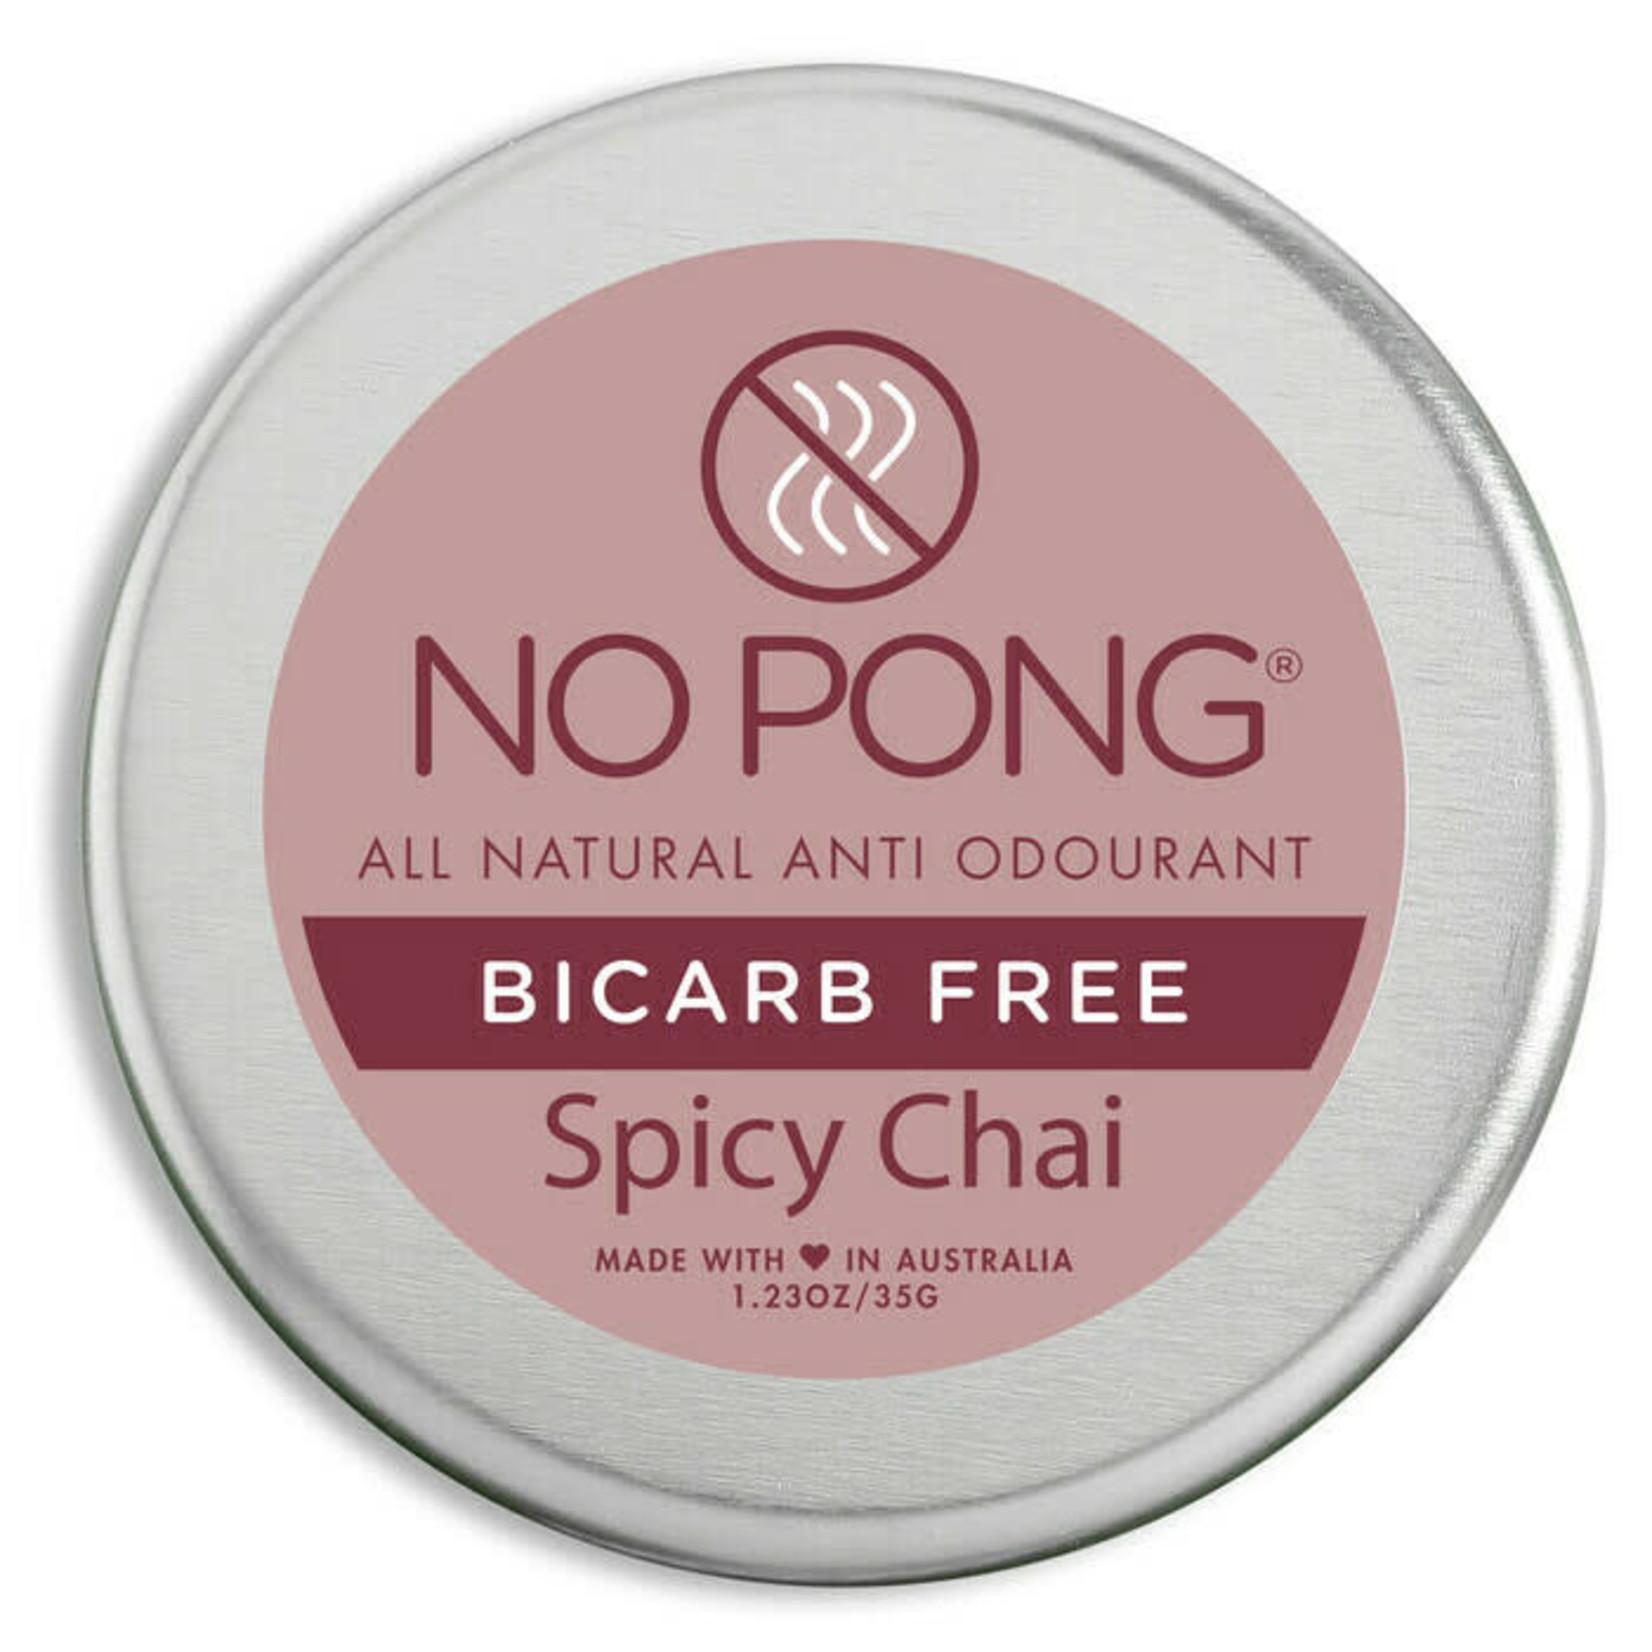 No Pong No Pong Spicy Chai BiCarb Free